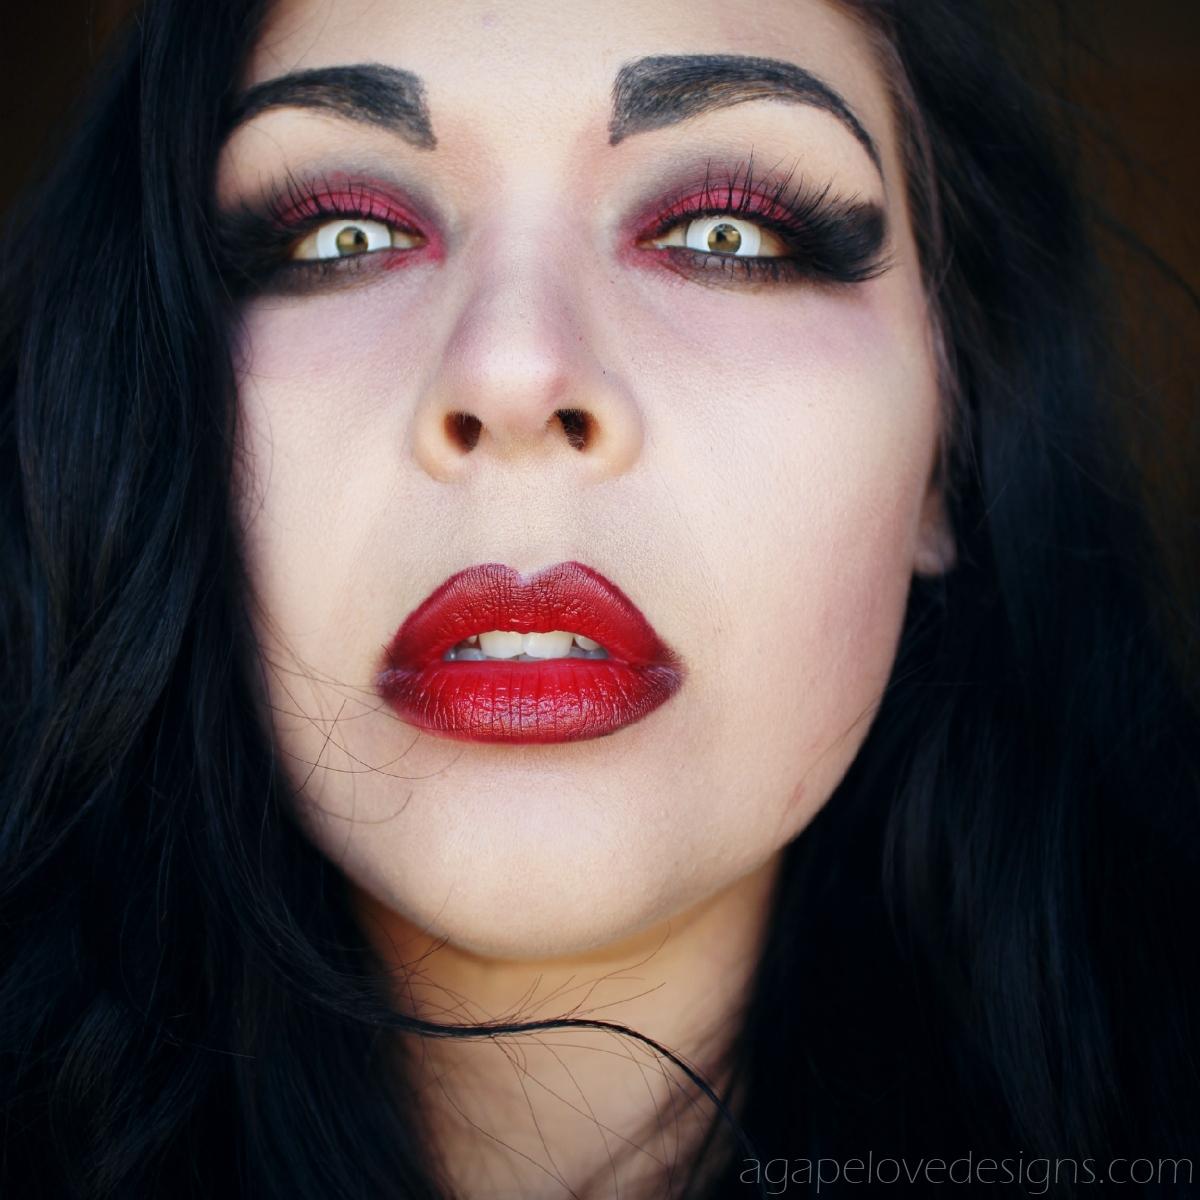 Makeup Ideas U00bb Vampire Makeup Tutorial - Beautiful Makeup Ideas And Tutorials